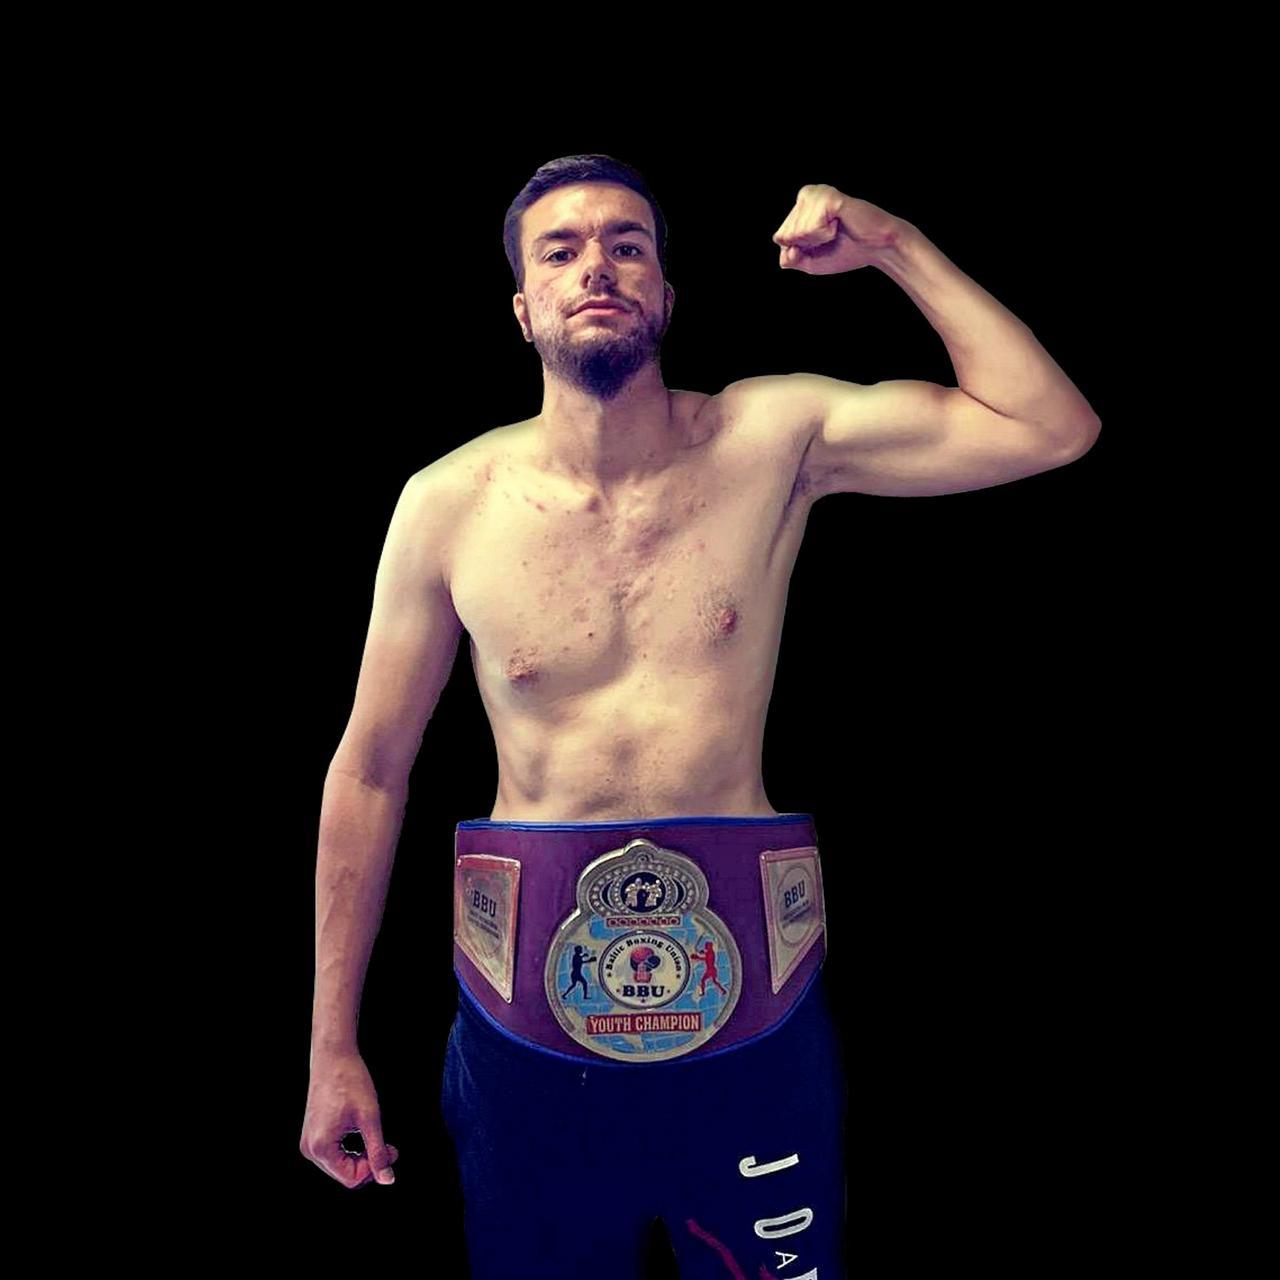 Alexander Kage ist neuer BBU Youth-Champion